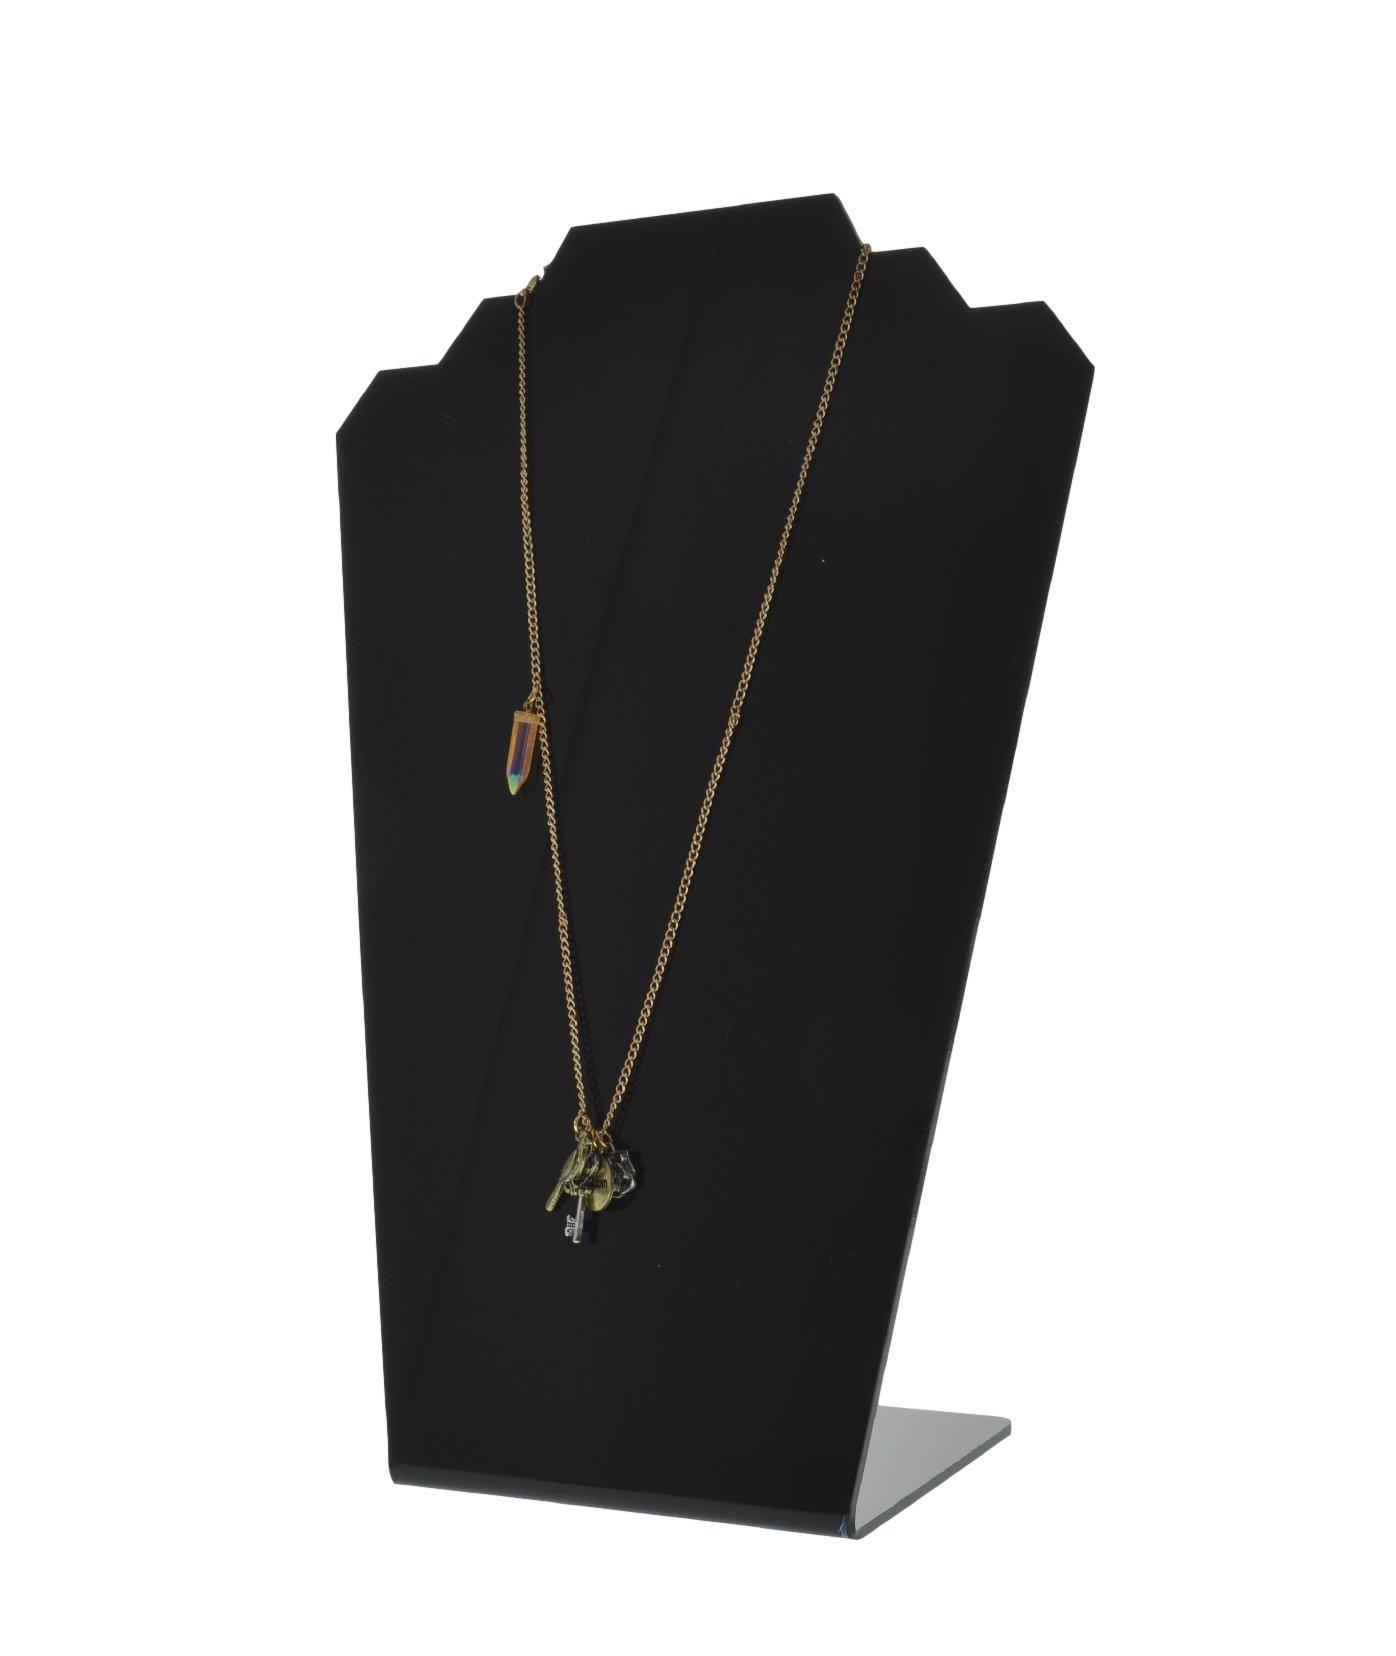 Marketing Holders Slantback Black Acrylic Necklace Holder Display Stand (pack of 24)